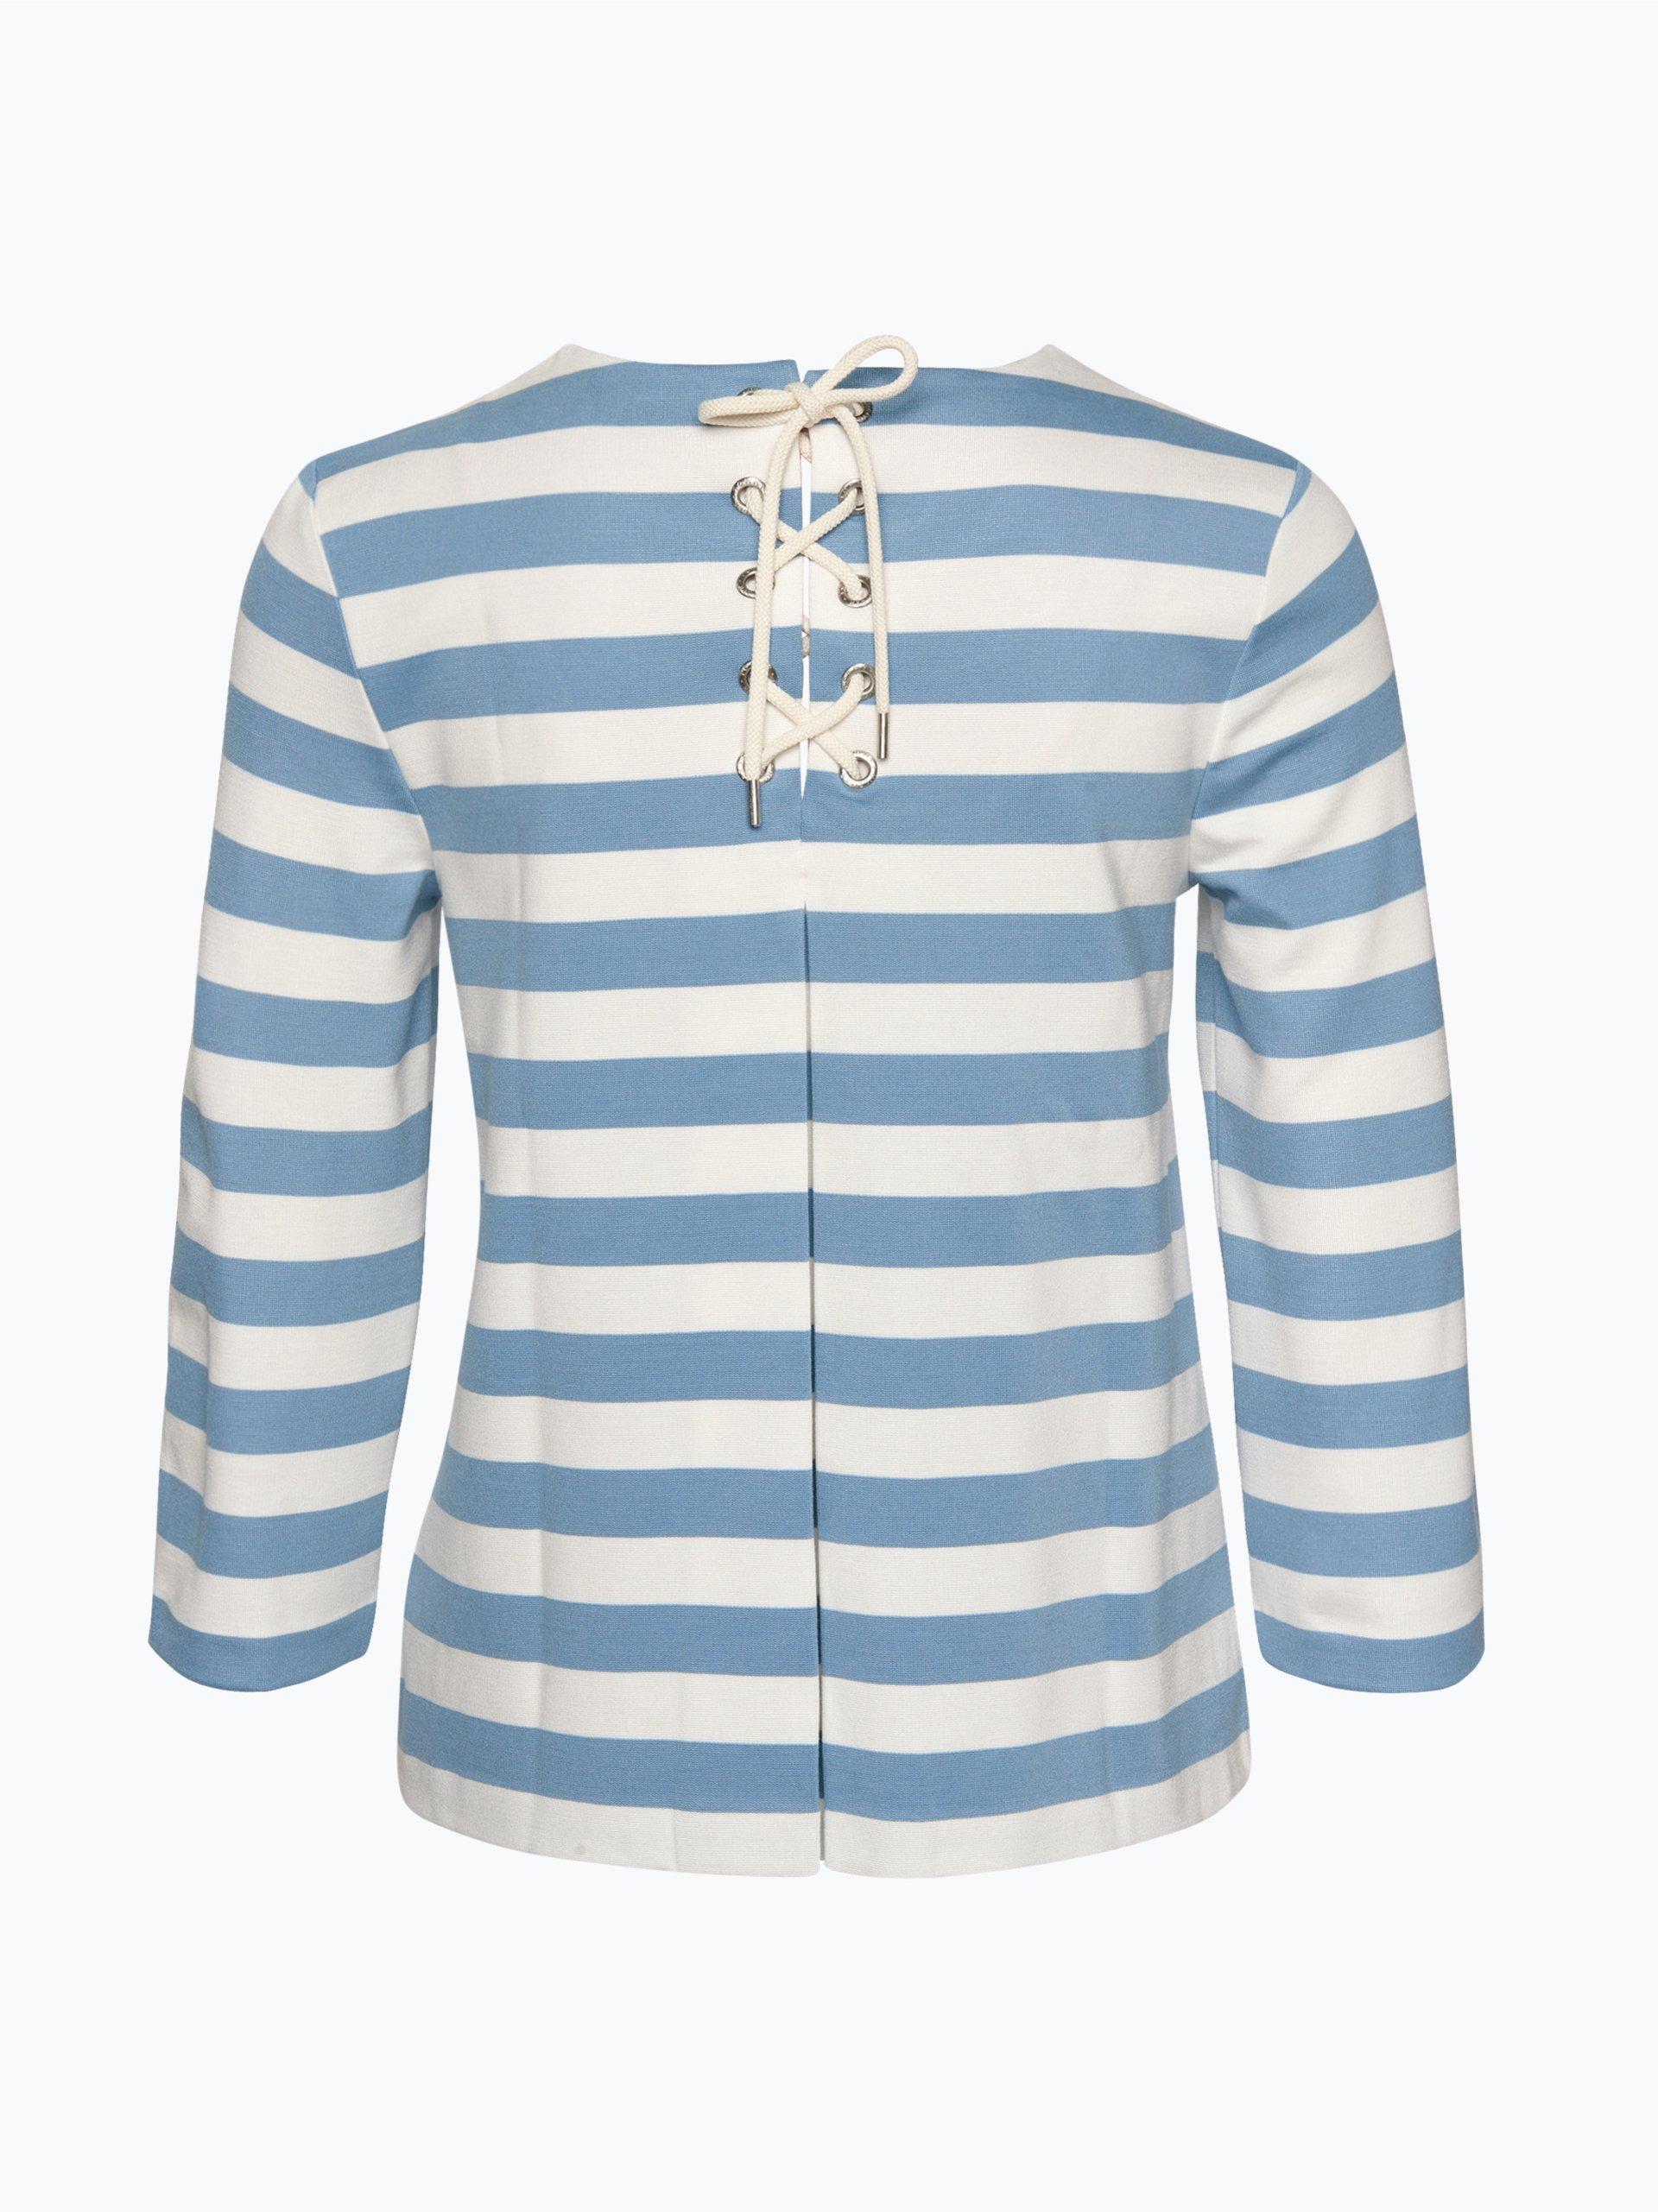 tommy hilfiger damen shirt linnet hellblau gestreift. Black Bedroom Furniture Sets. Home Design Ideas